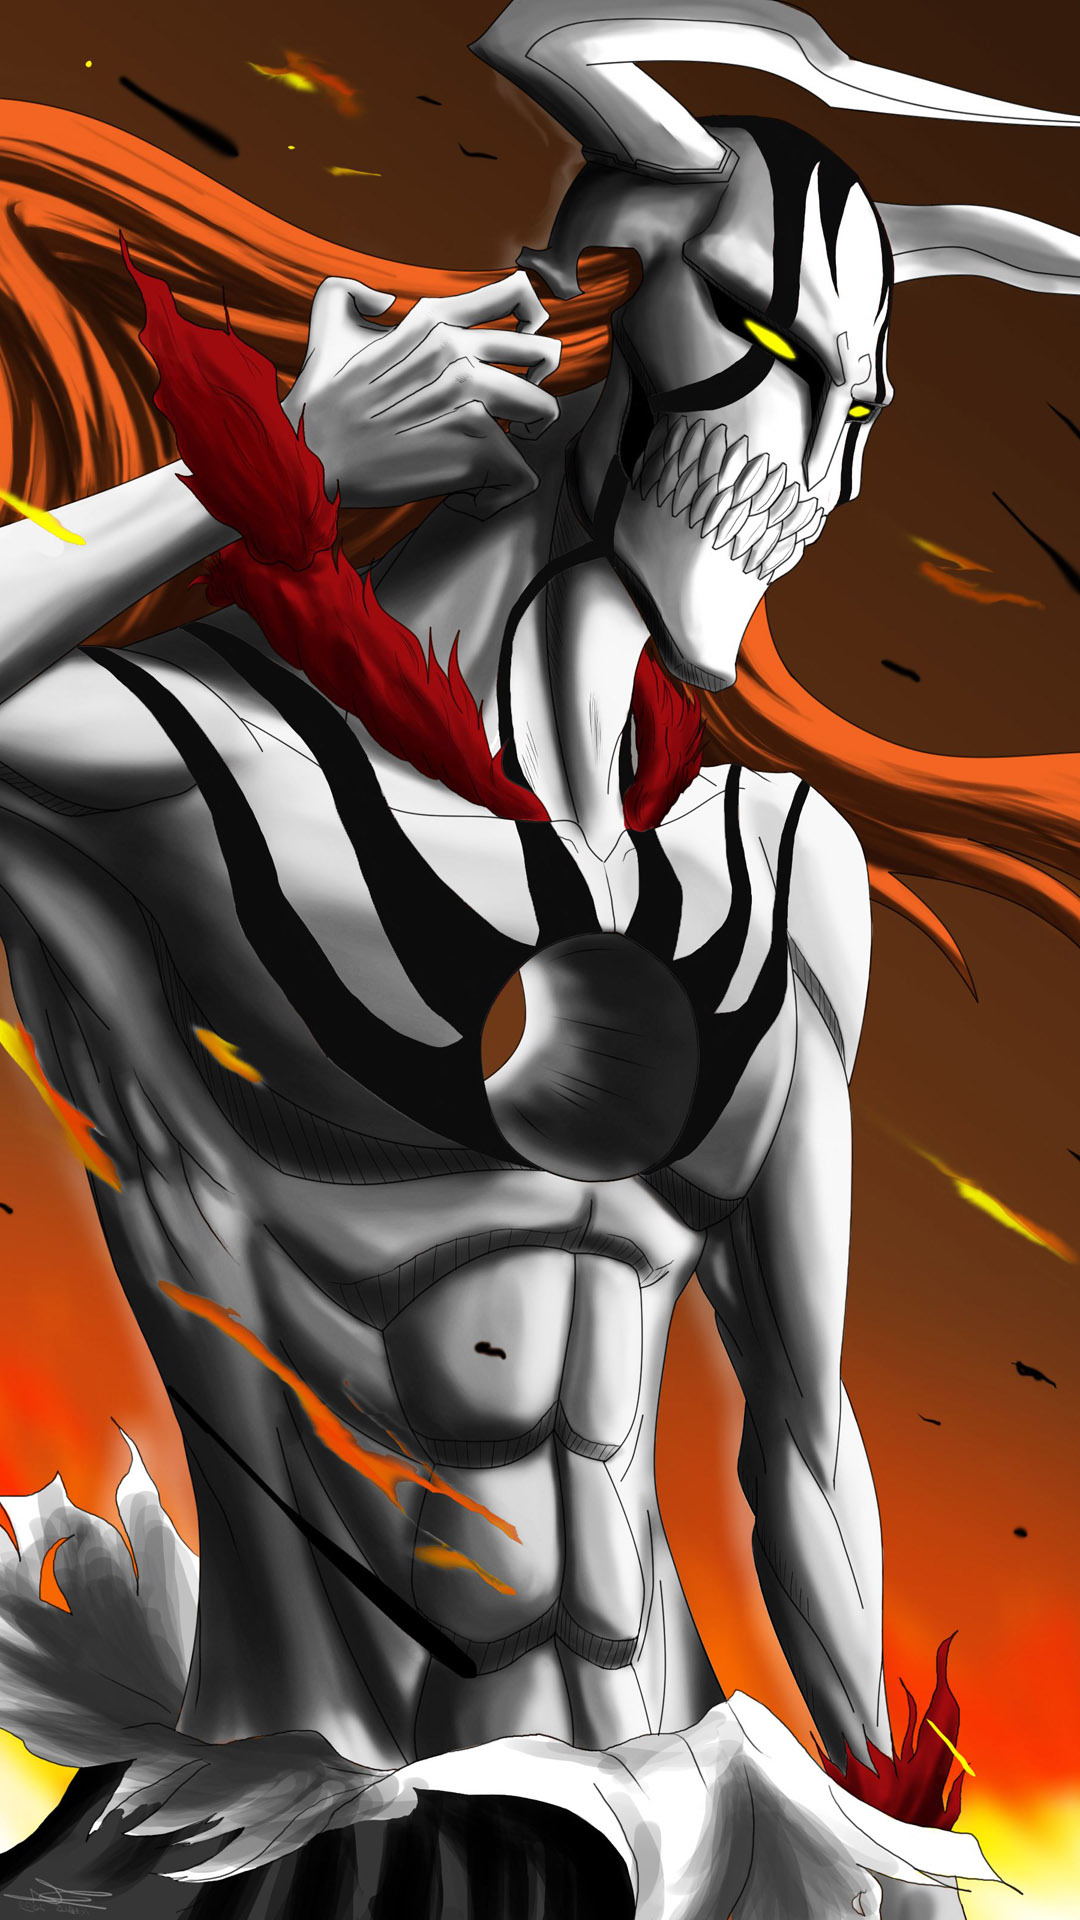 Bleach Wallpapers HD Anime 1080x1920